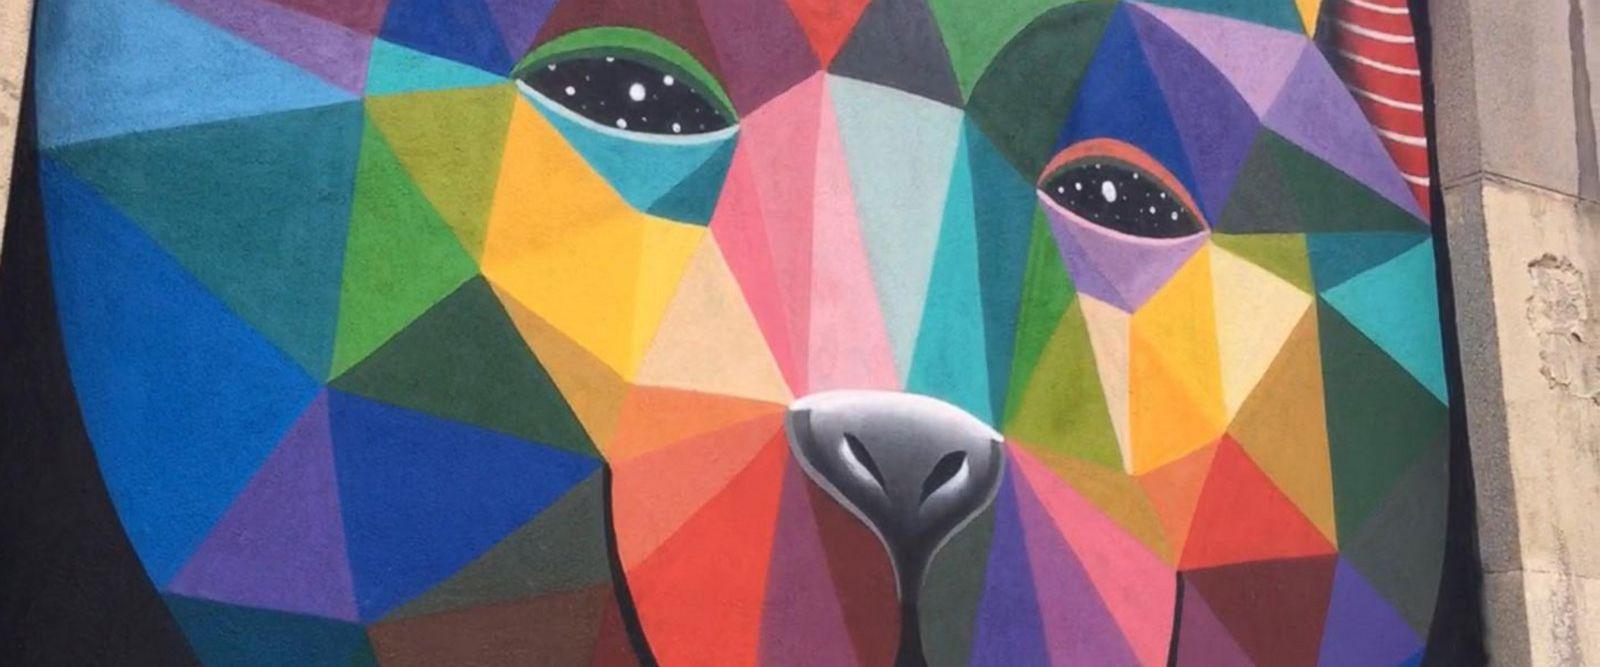 VIDEO: A tour of the Madrid street art scene